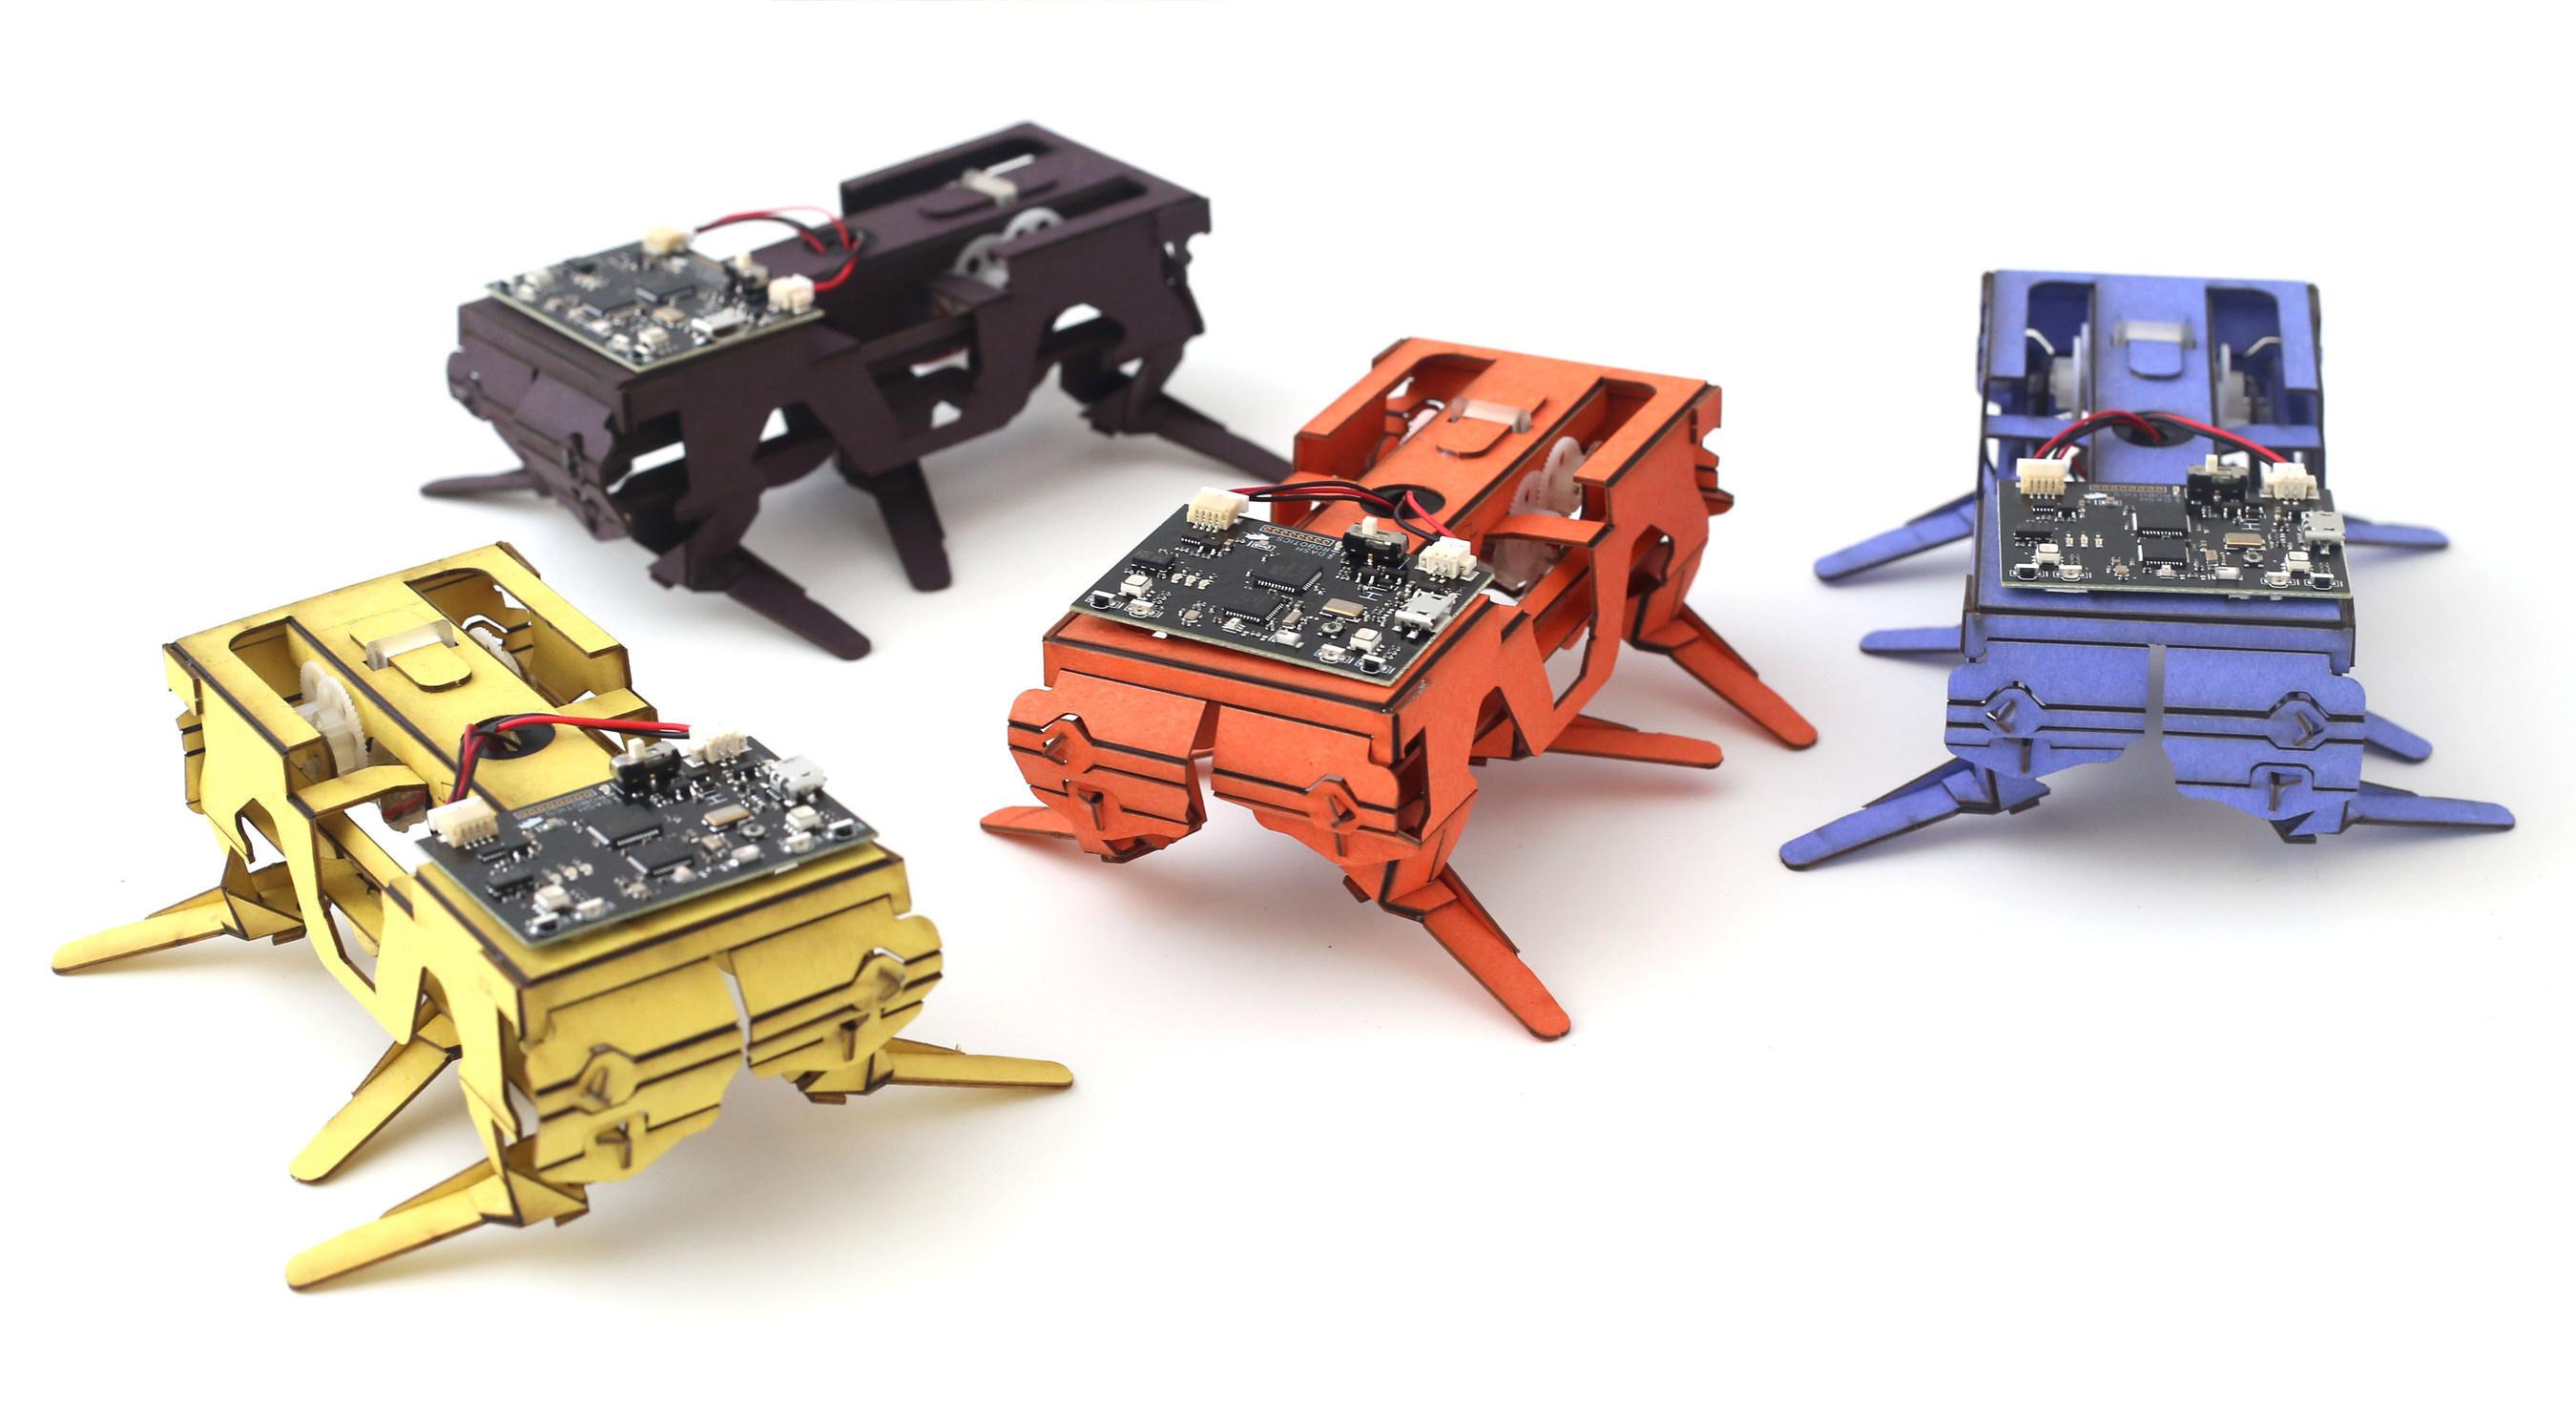 The original Dash Robot